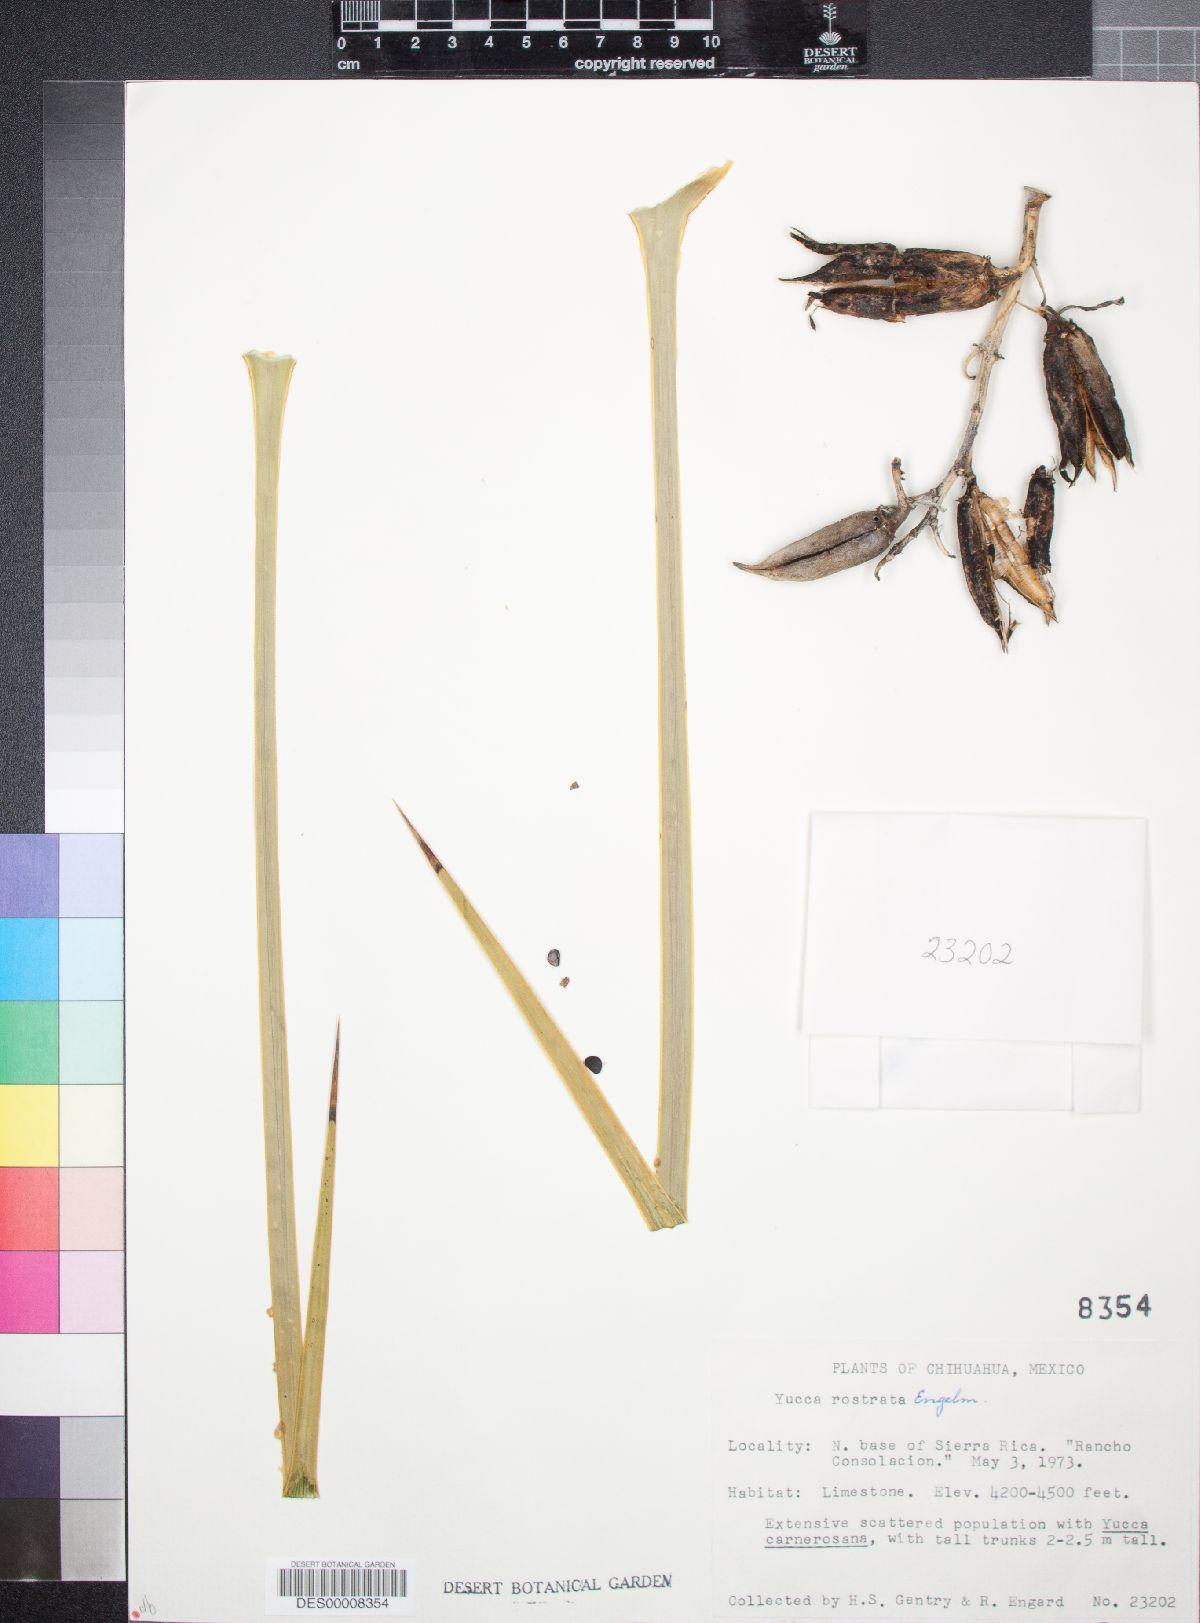 Yucca rostrata image